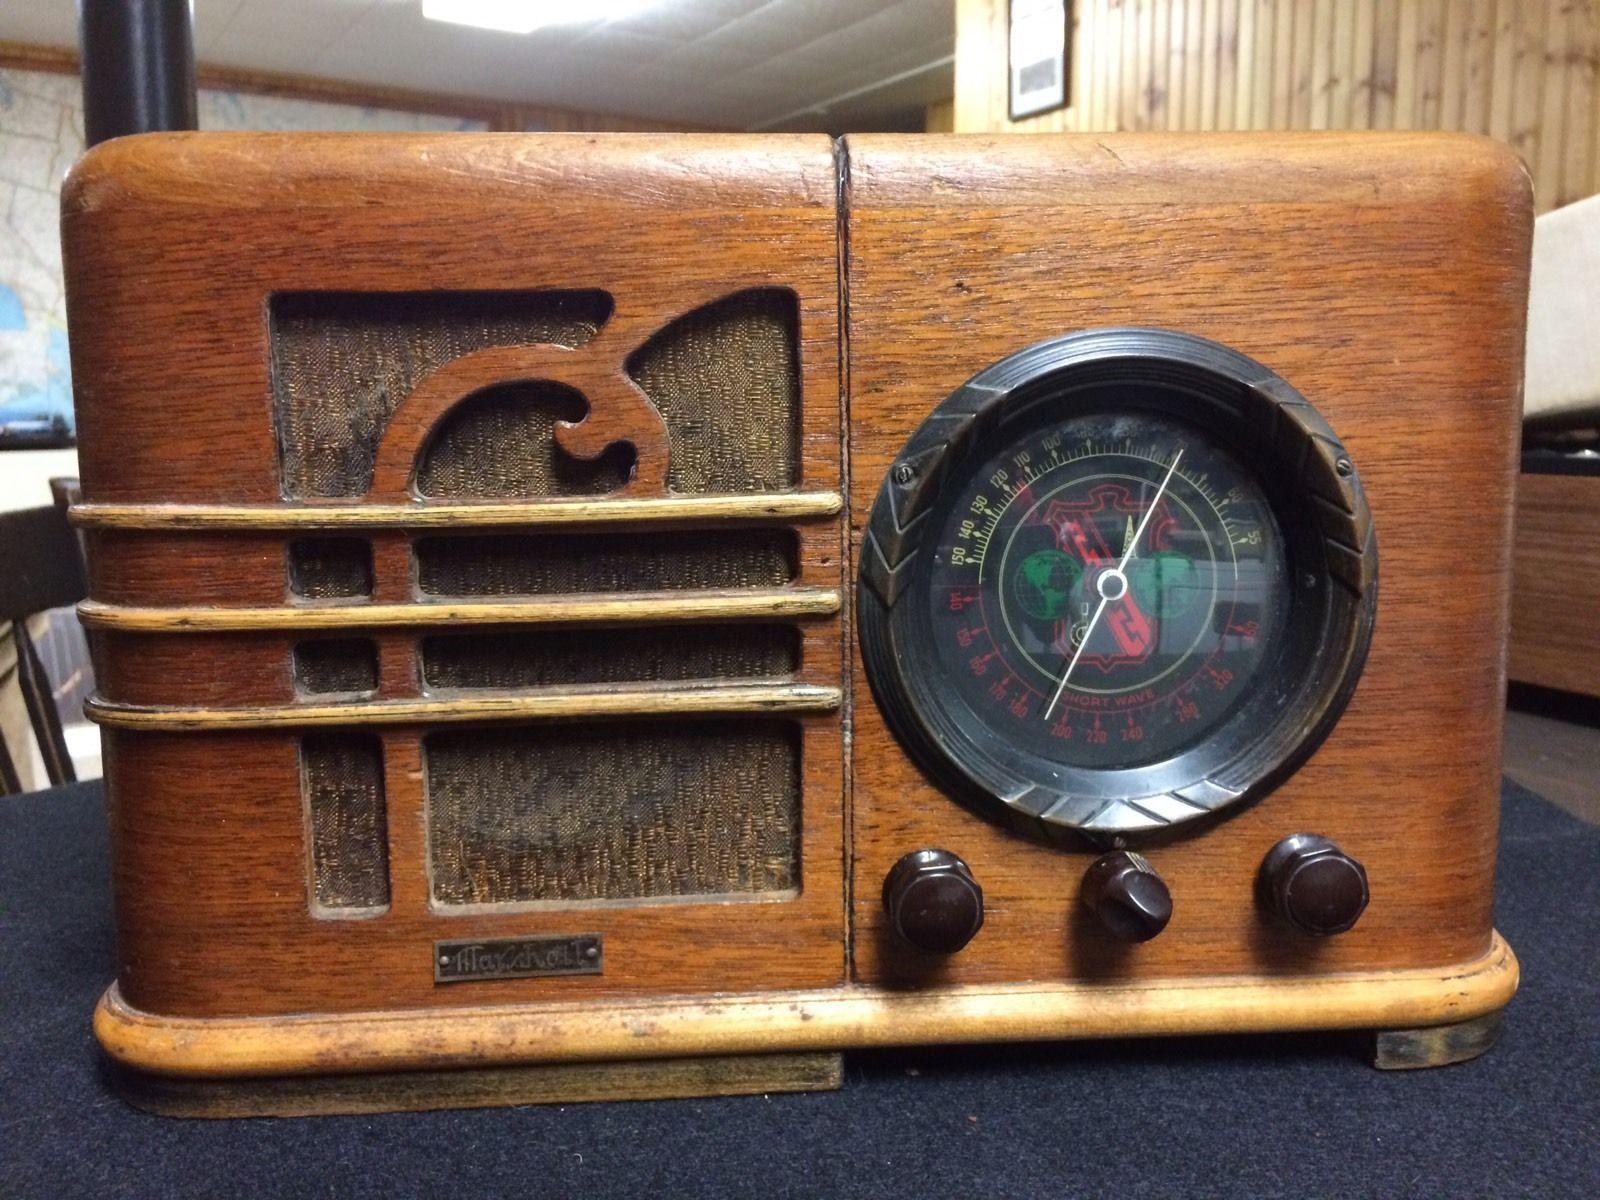 Marshall Antique Am Amp Shortwave 2 Band Art Deco Wooden Old Radio 039 30s No Cord Ebay Vintage Radio Radio Design Old Radios